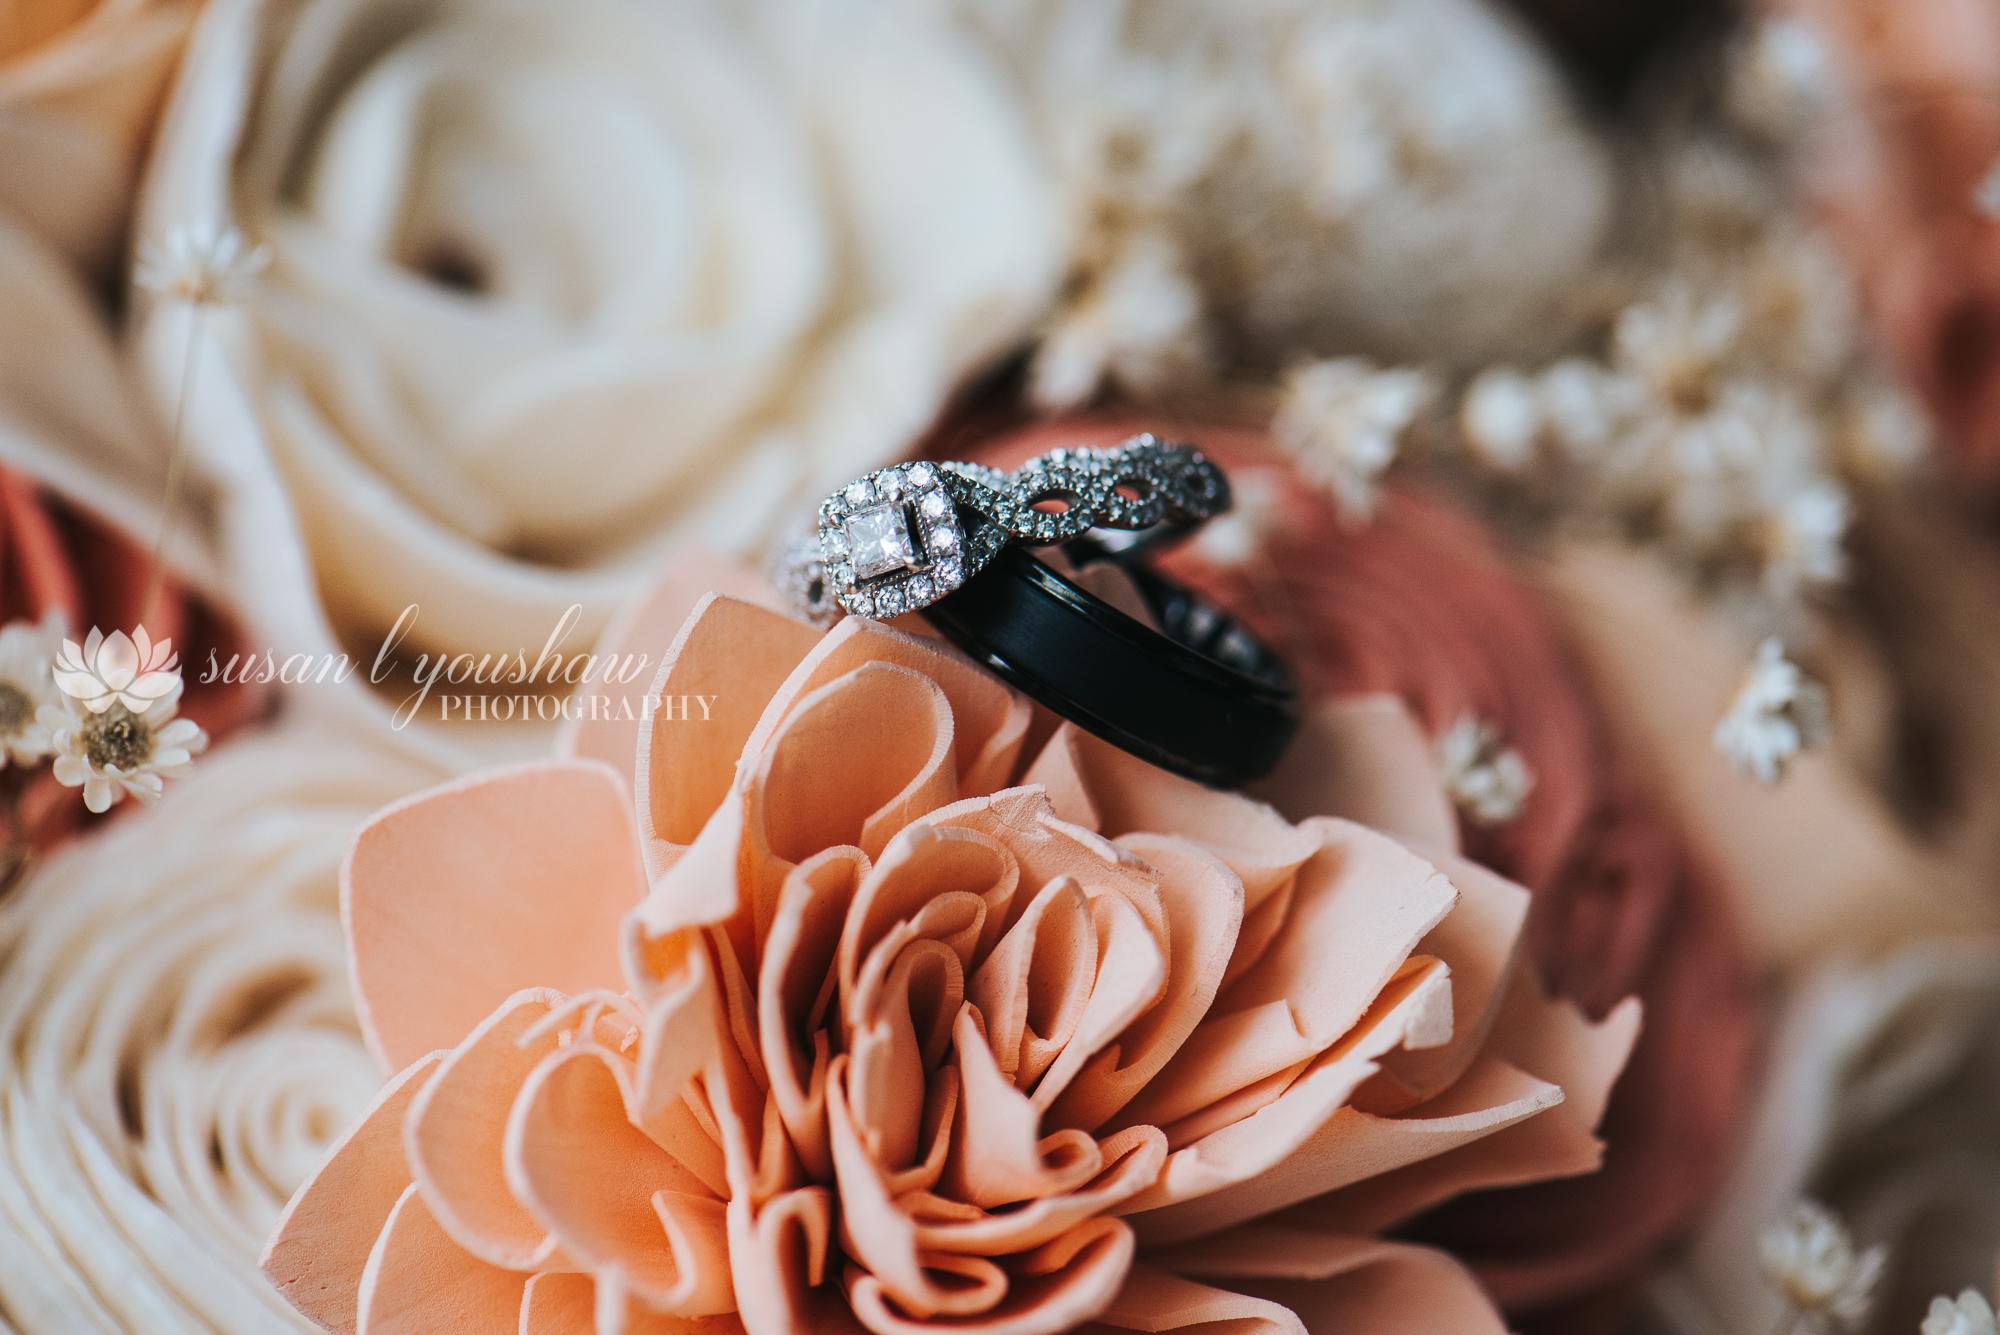 Bill and Sarah Wedding Photos 06-08-2019 SLY Photography -22.jpg